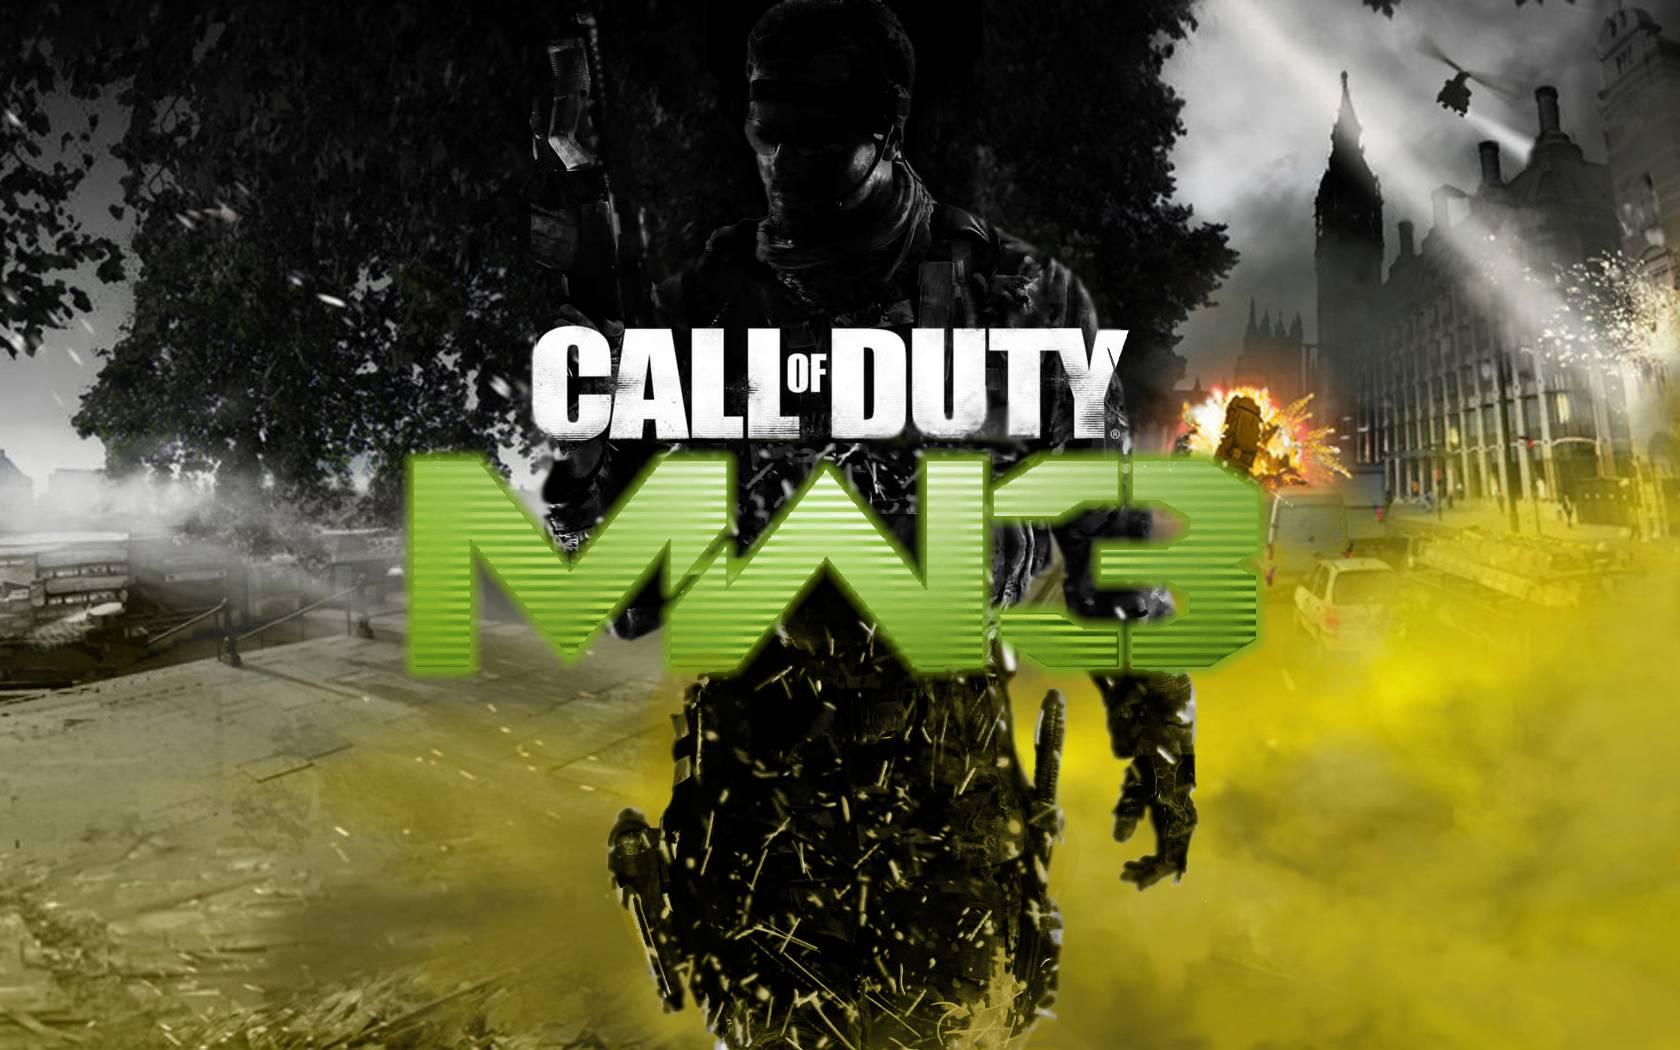 Modern Warfare 3 Wallpapers In 1080P HD GamingBoltcom Video Game 1680x1050